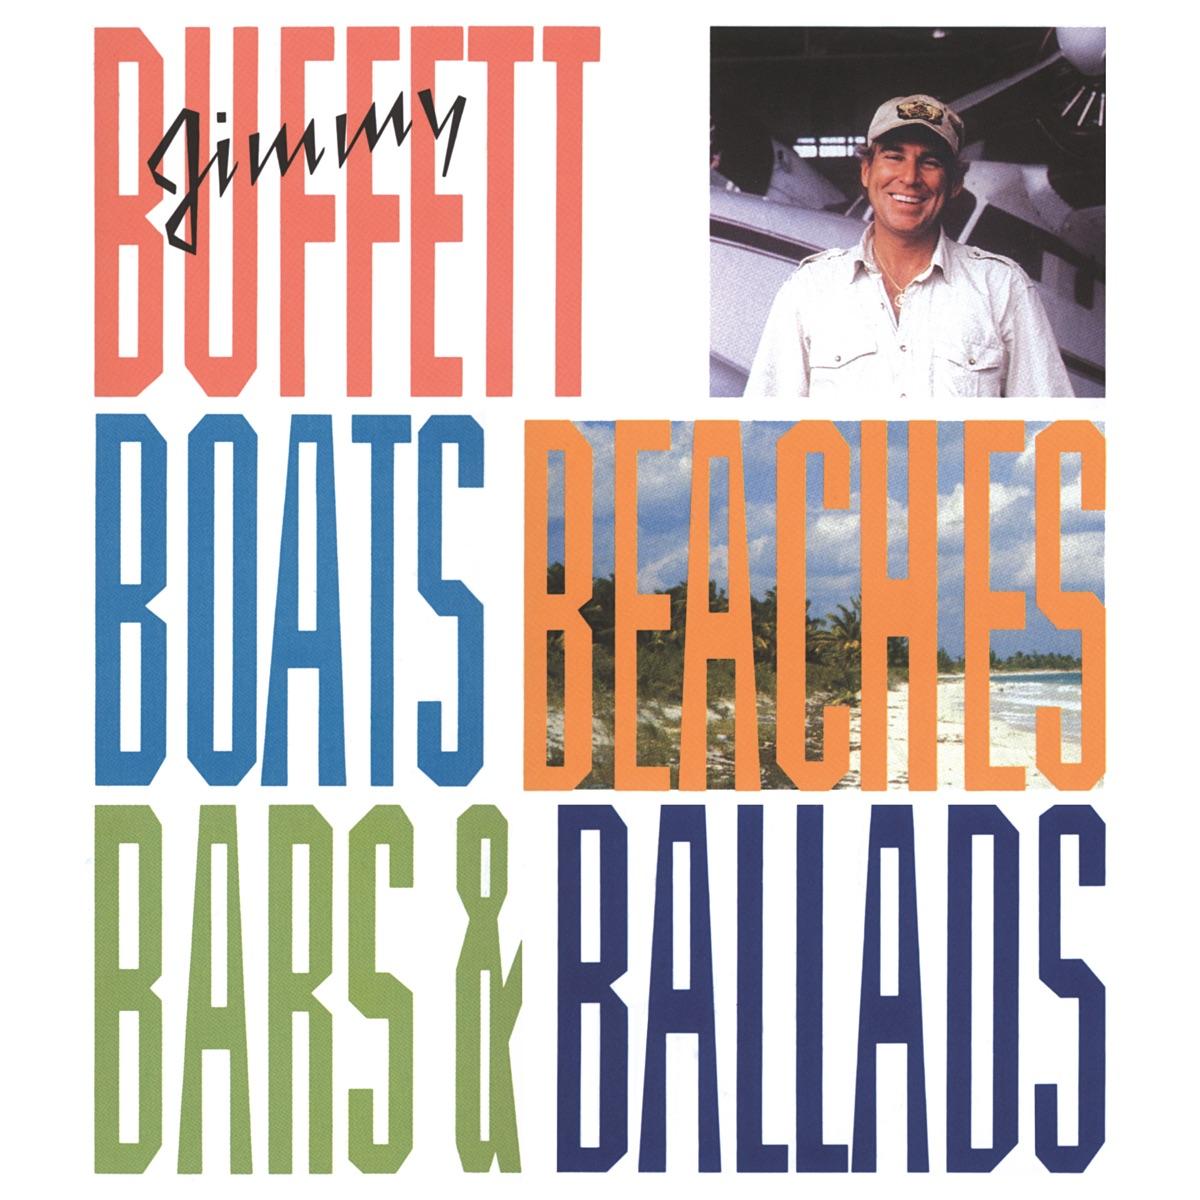 Boats, Beaches, Bars & Ballads Album Cover by Jimmy Buffett